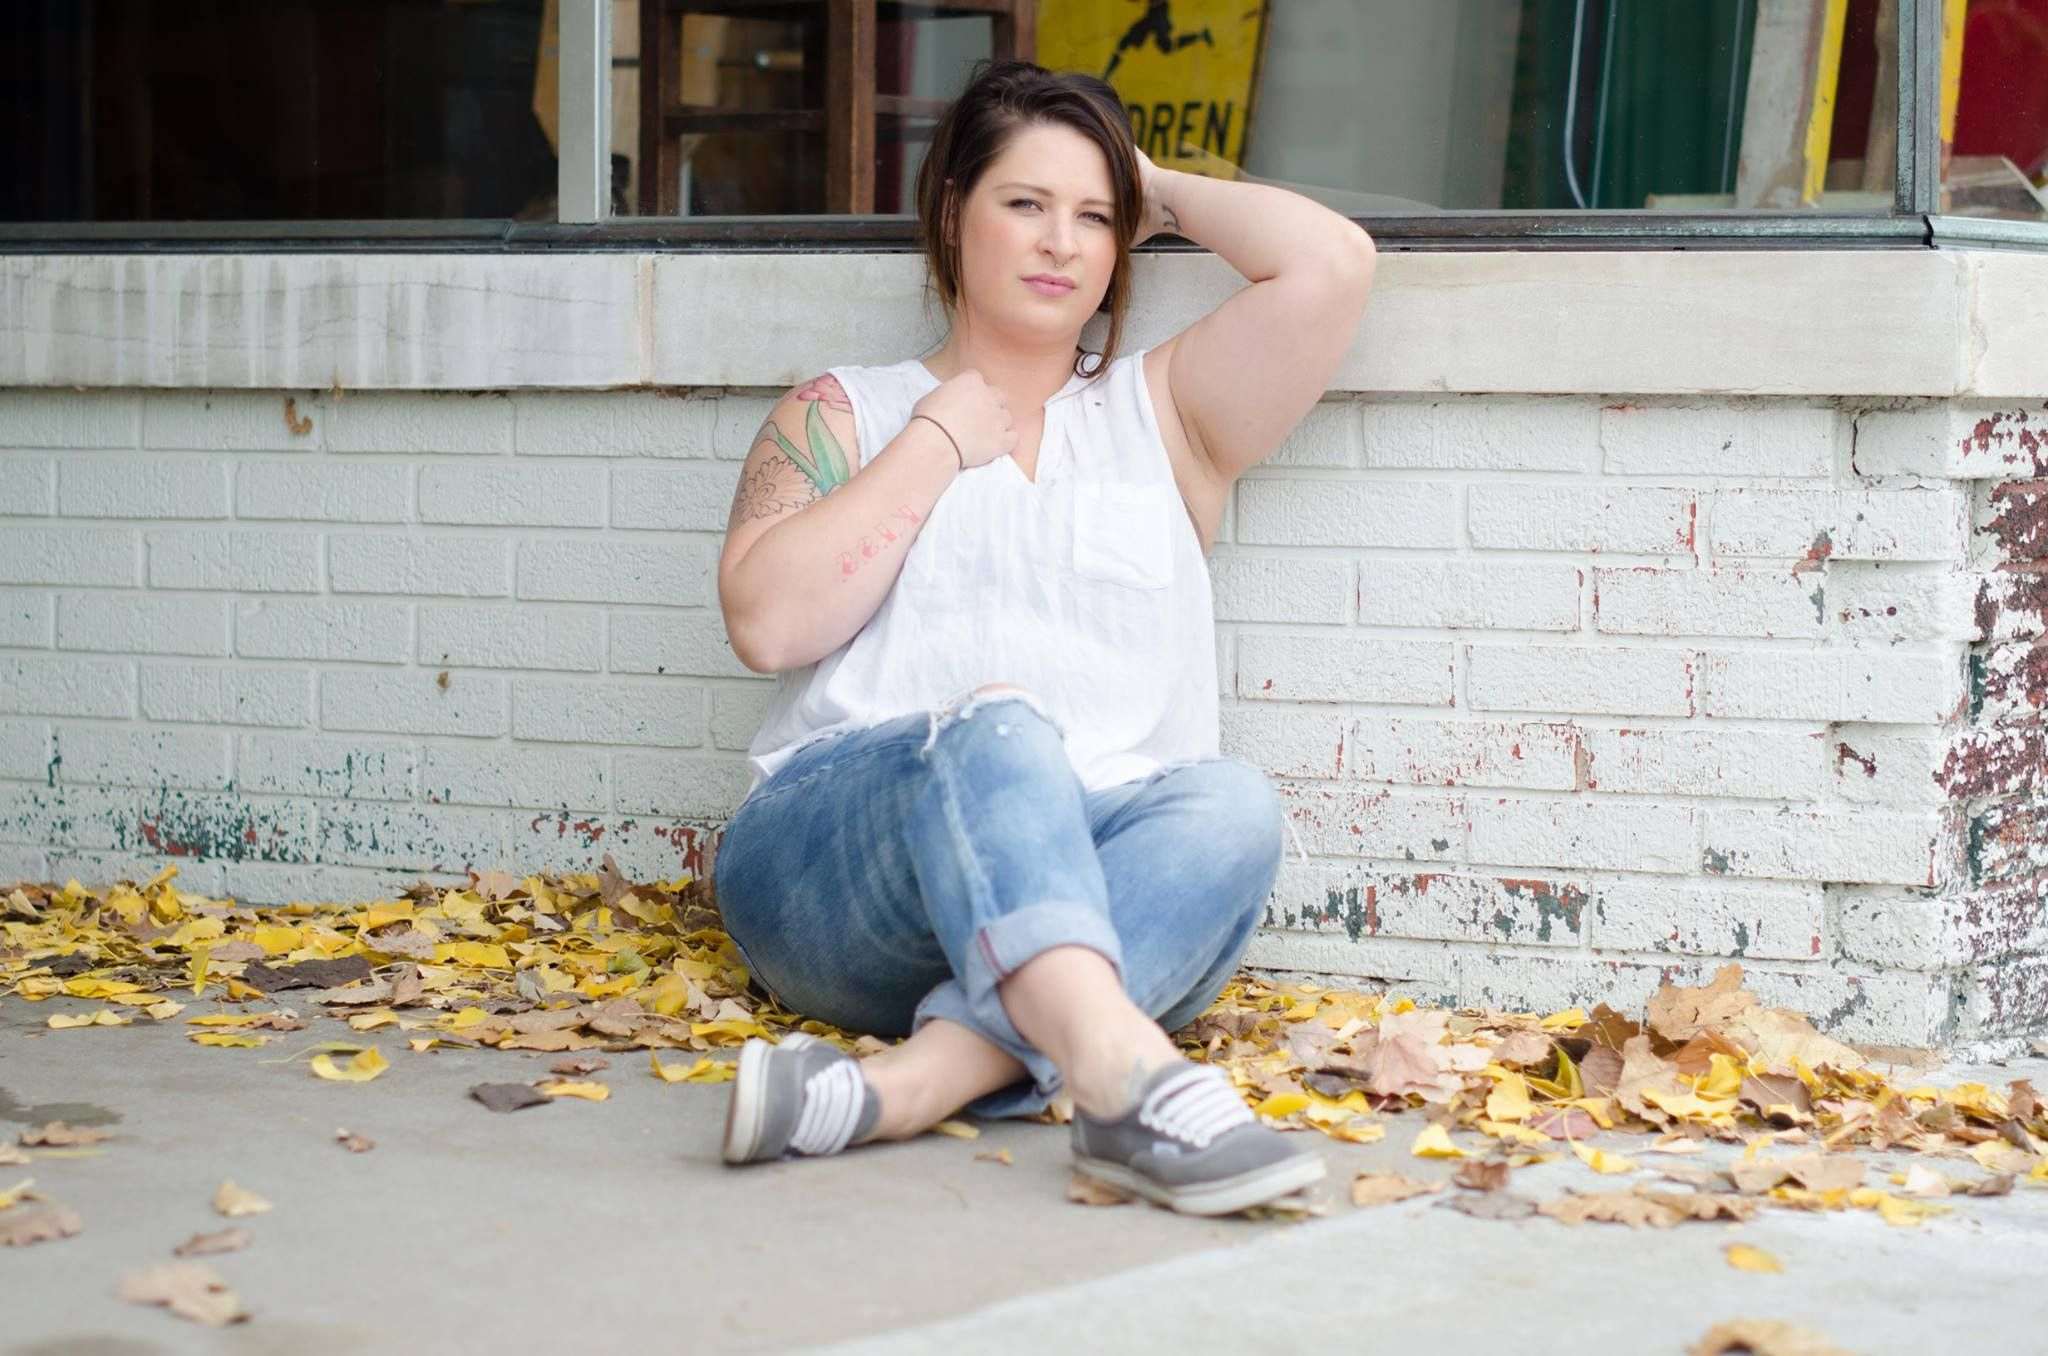 Kristen, tattoo artist; INK INK Tattoos and Piercings